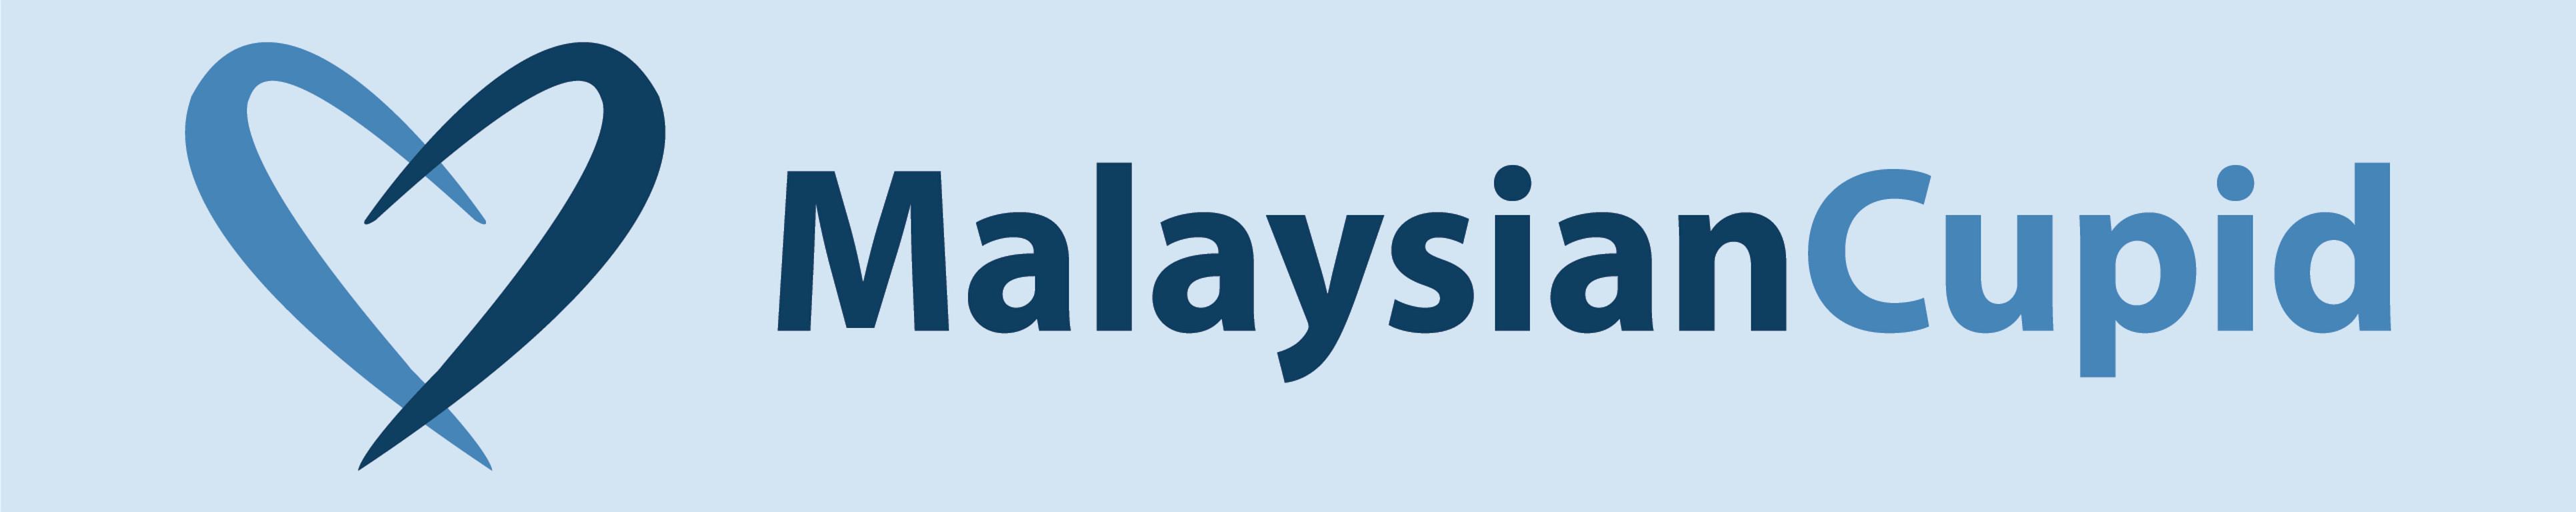 MalaysianCupid Trademark